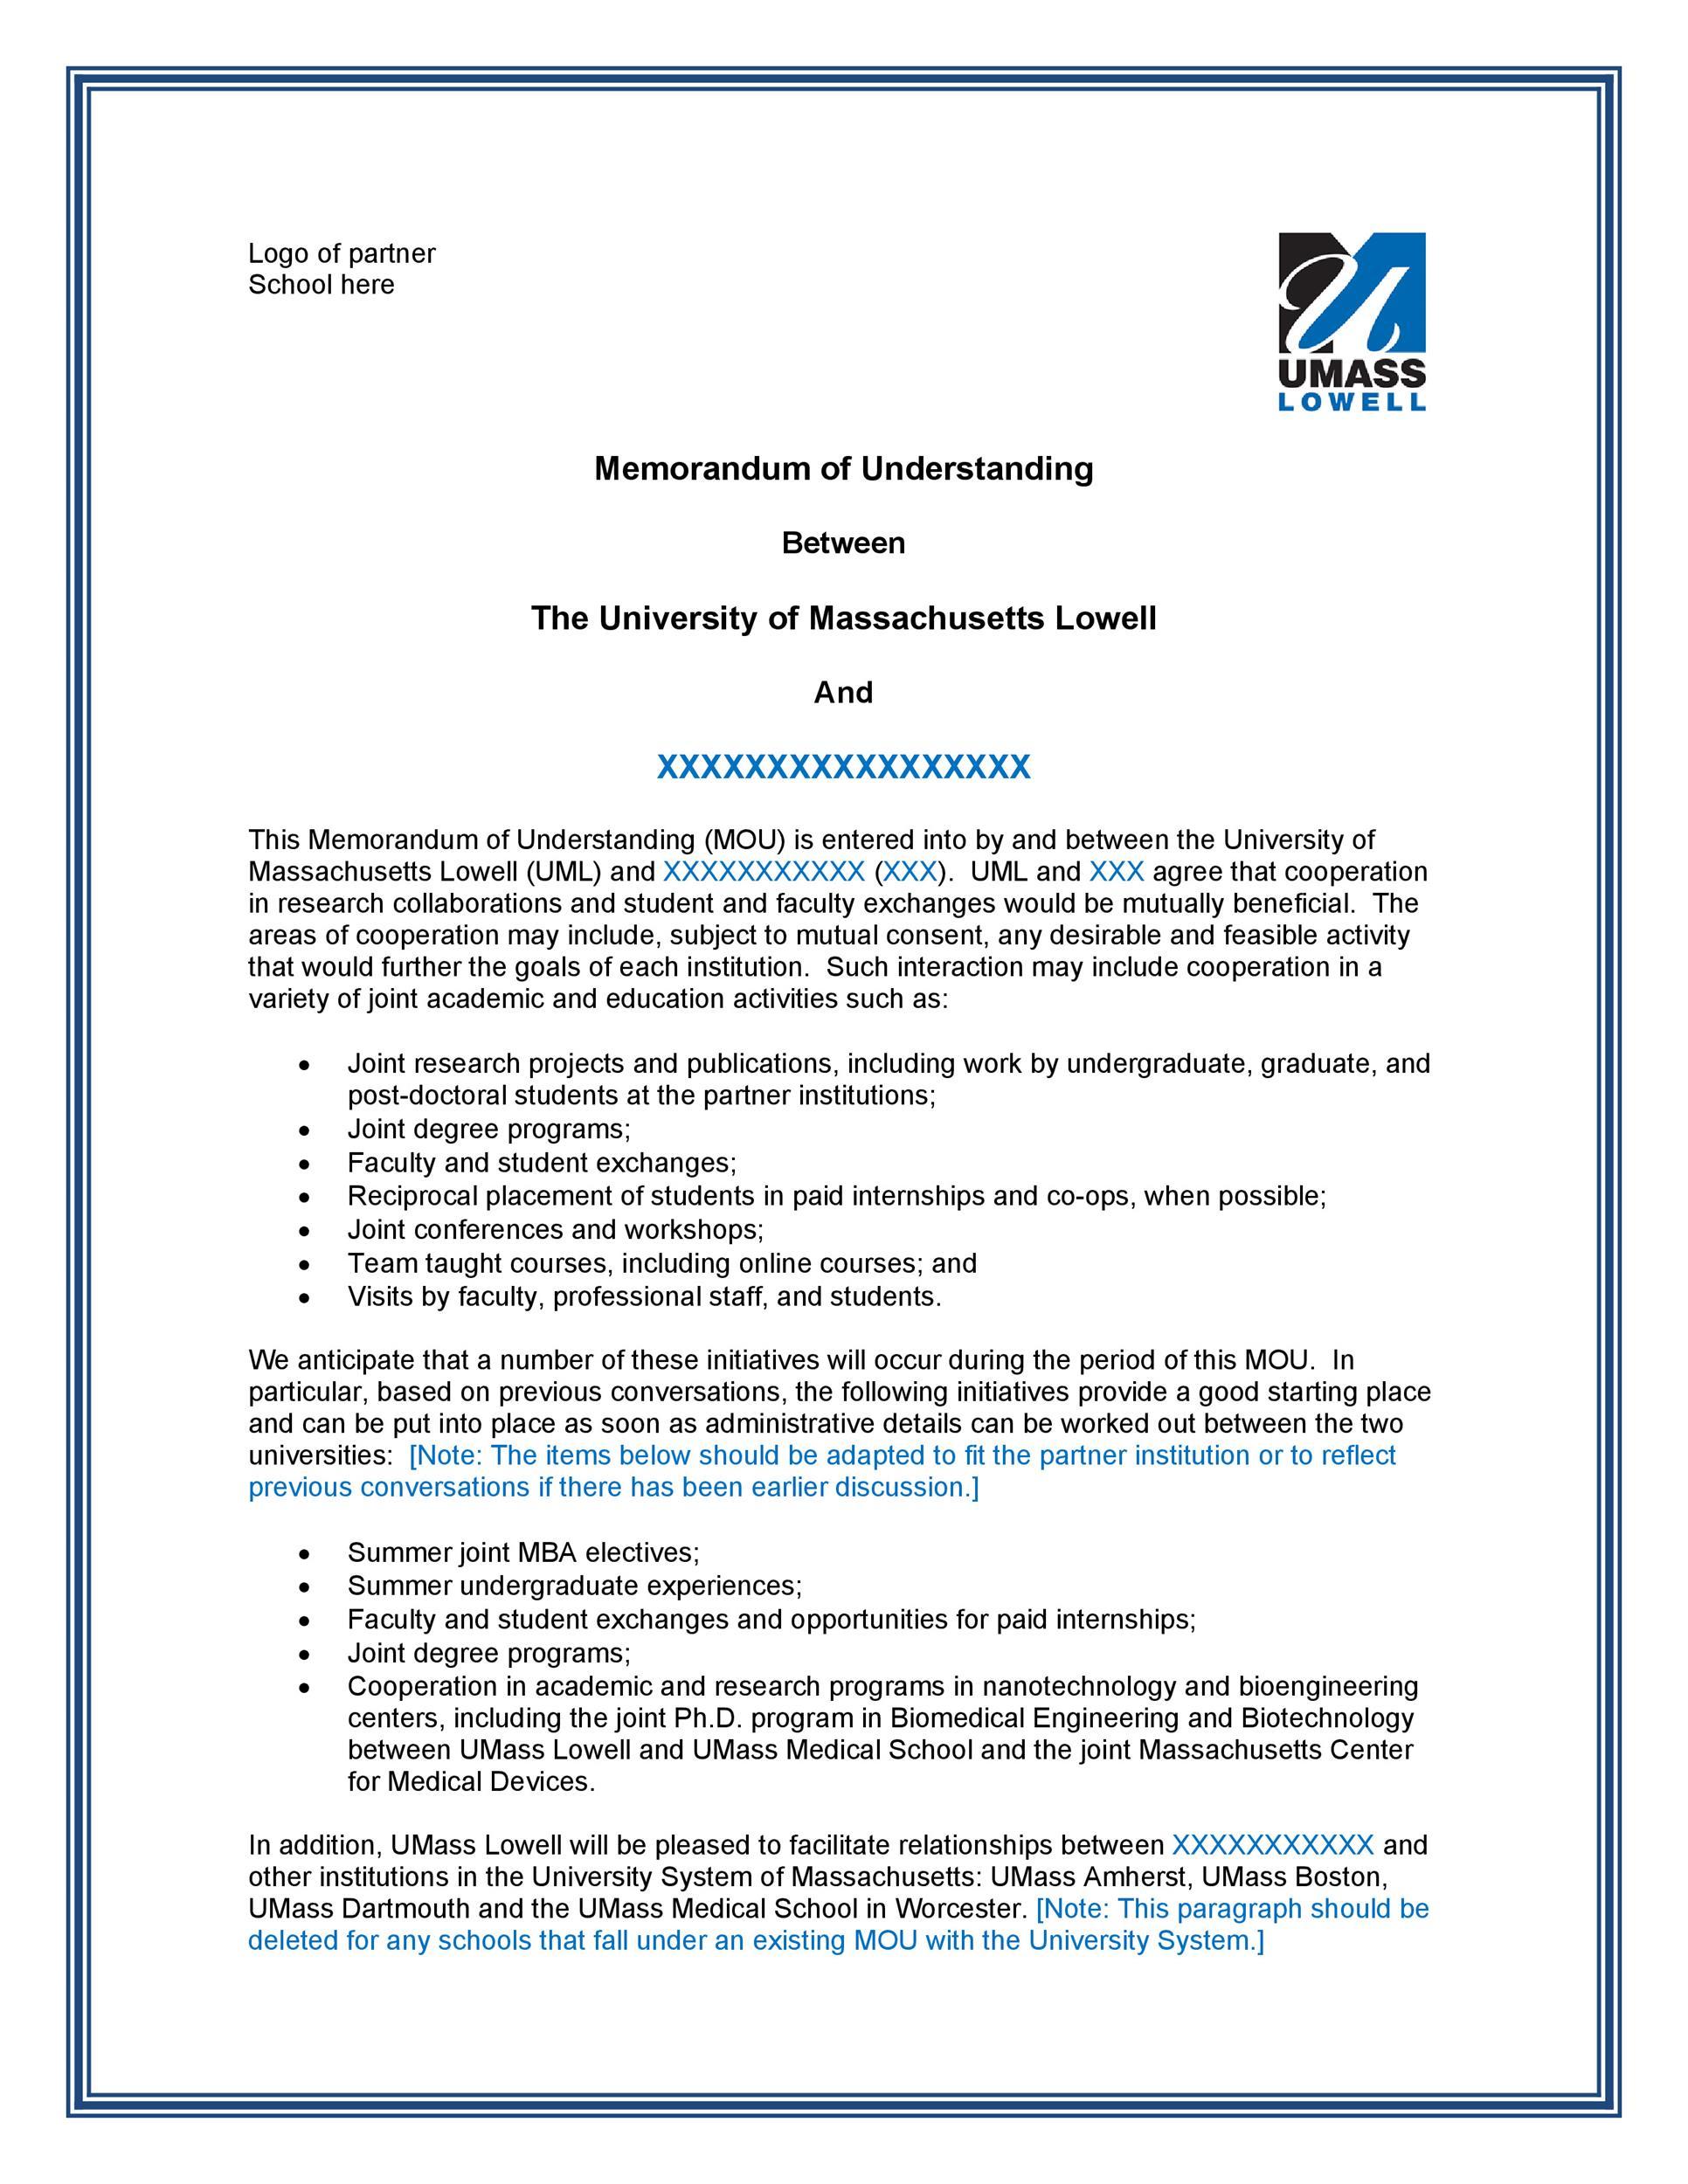 Free Memorandum of Understanding Template 45